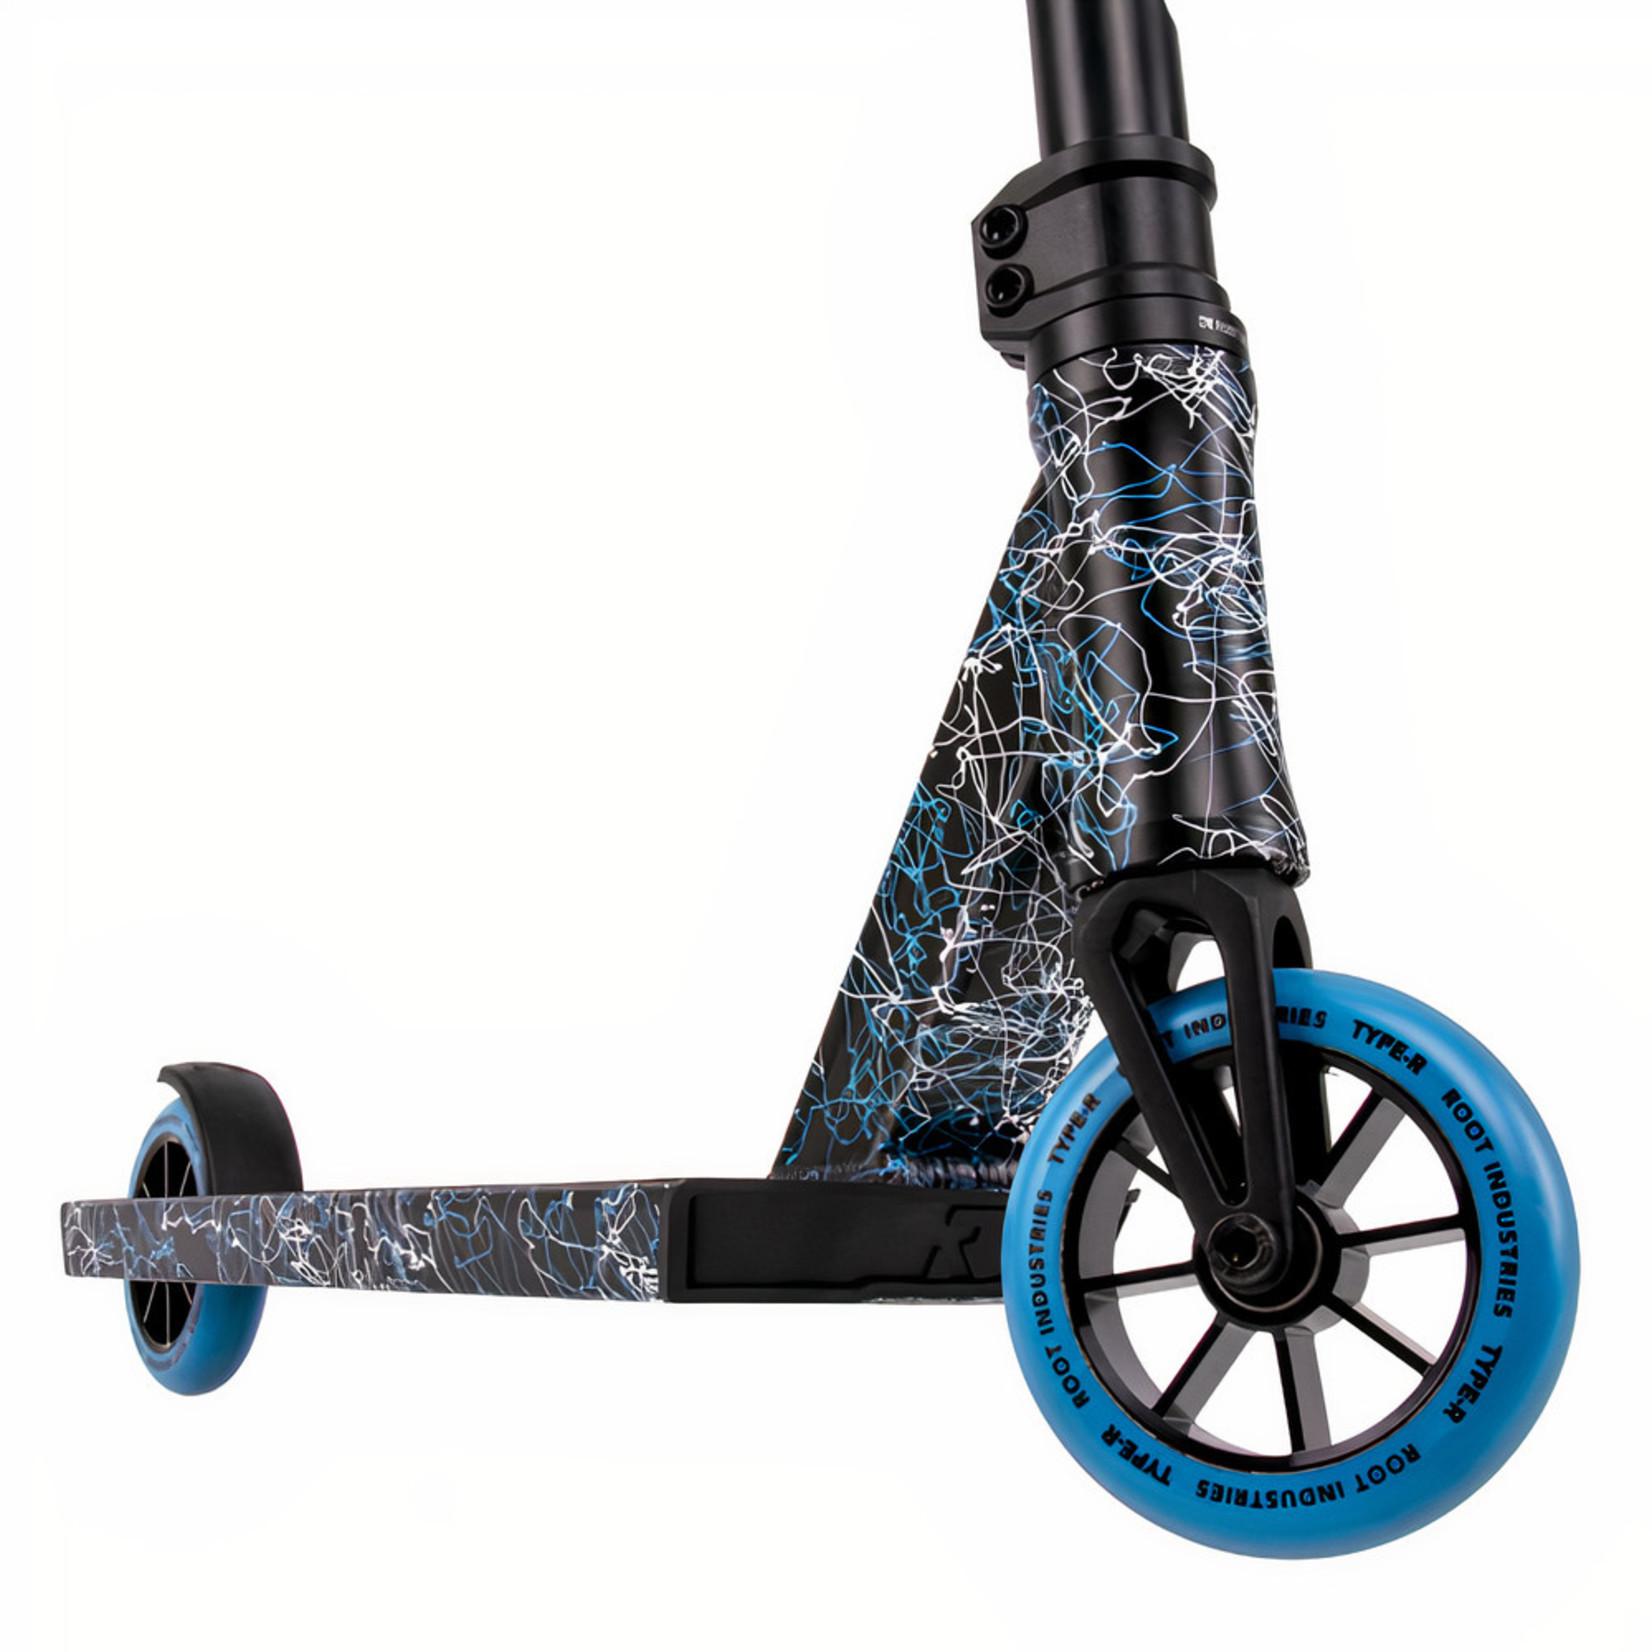 Root Industries Root Industries - Type-R Complete - Blue/Black/White Splatter